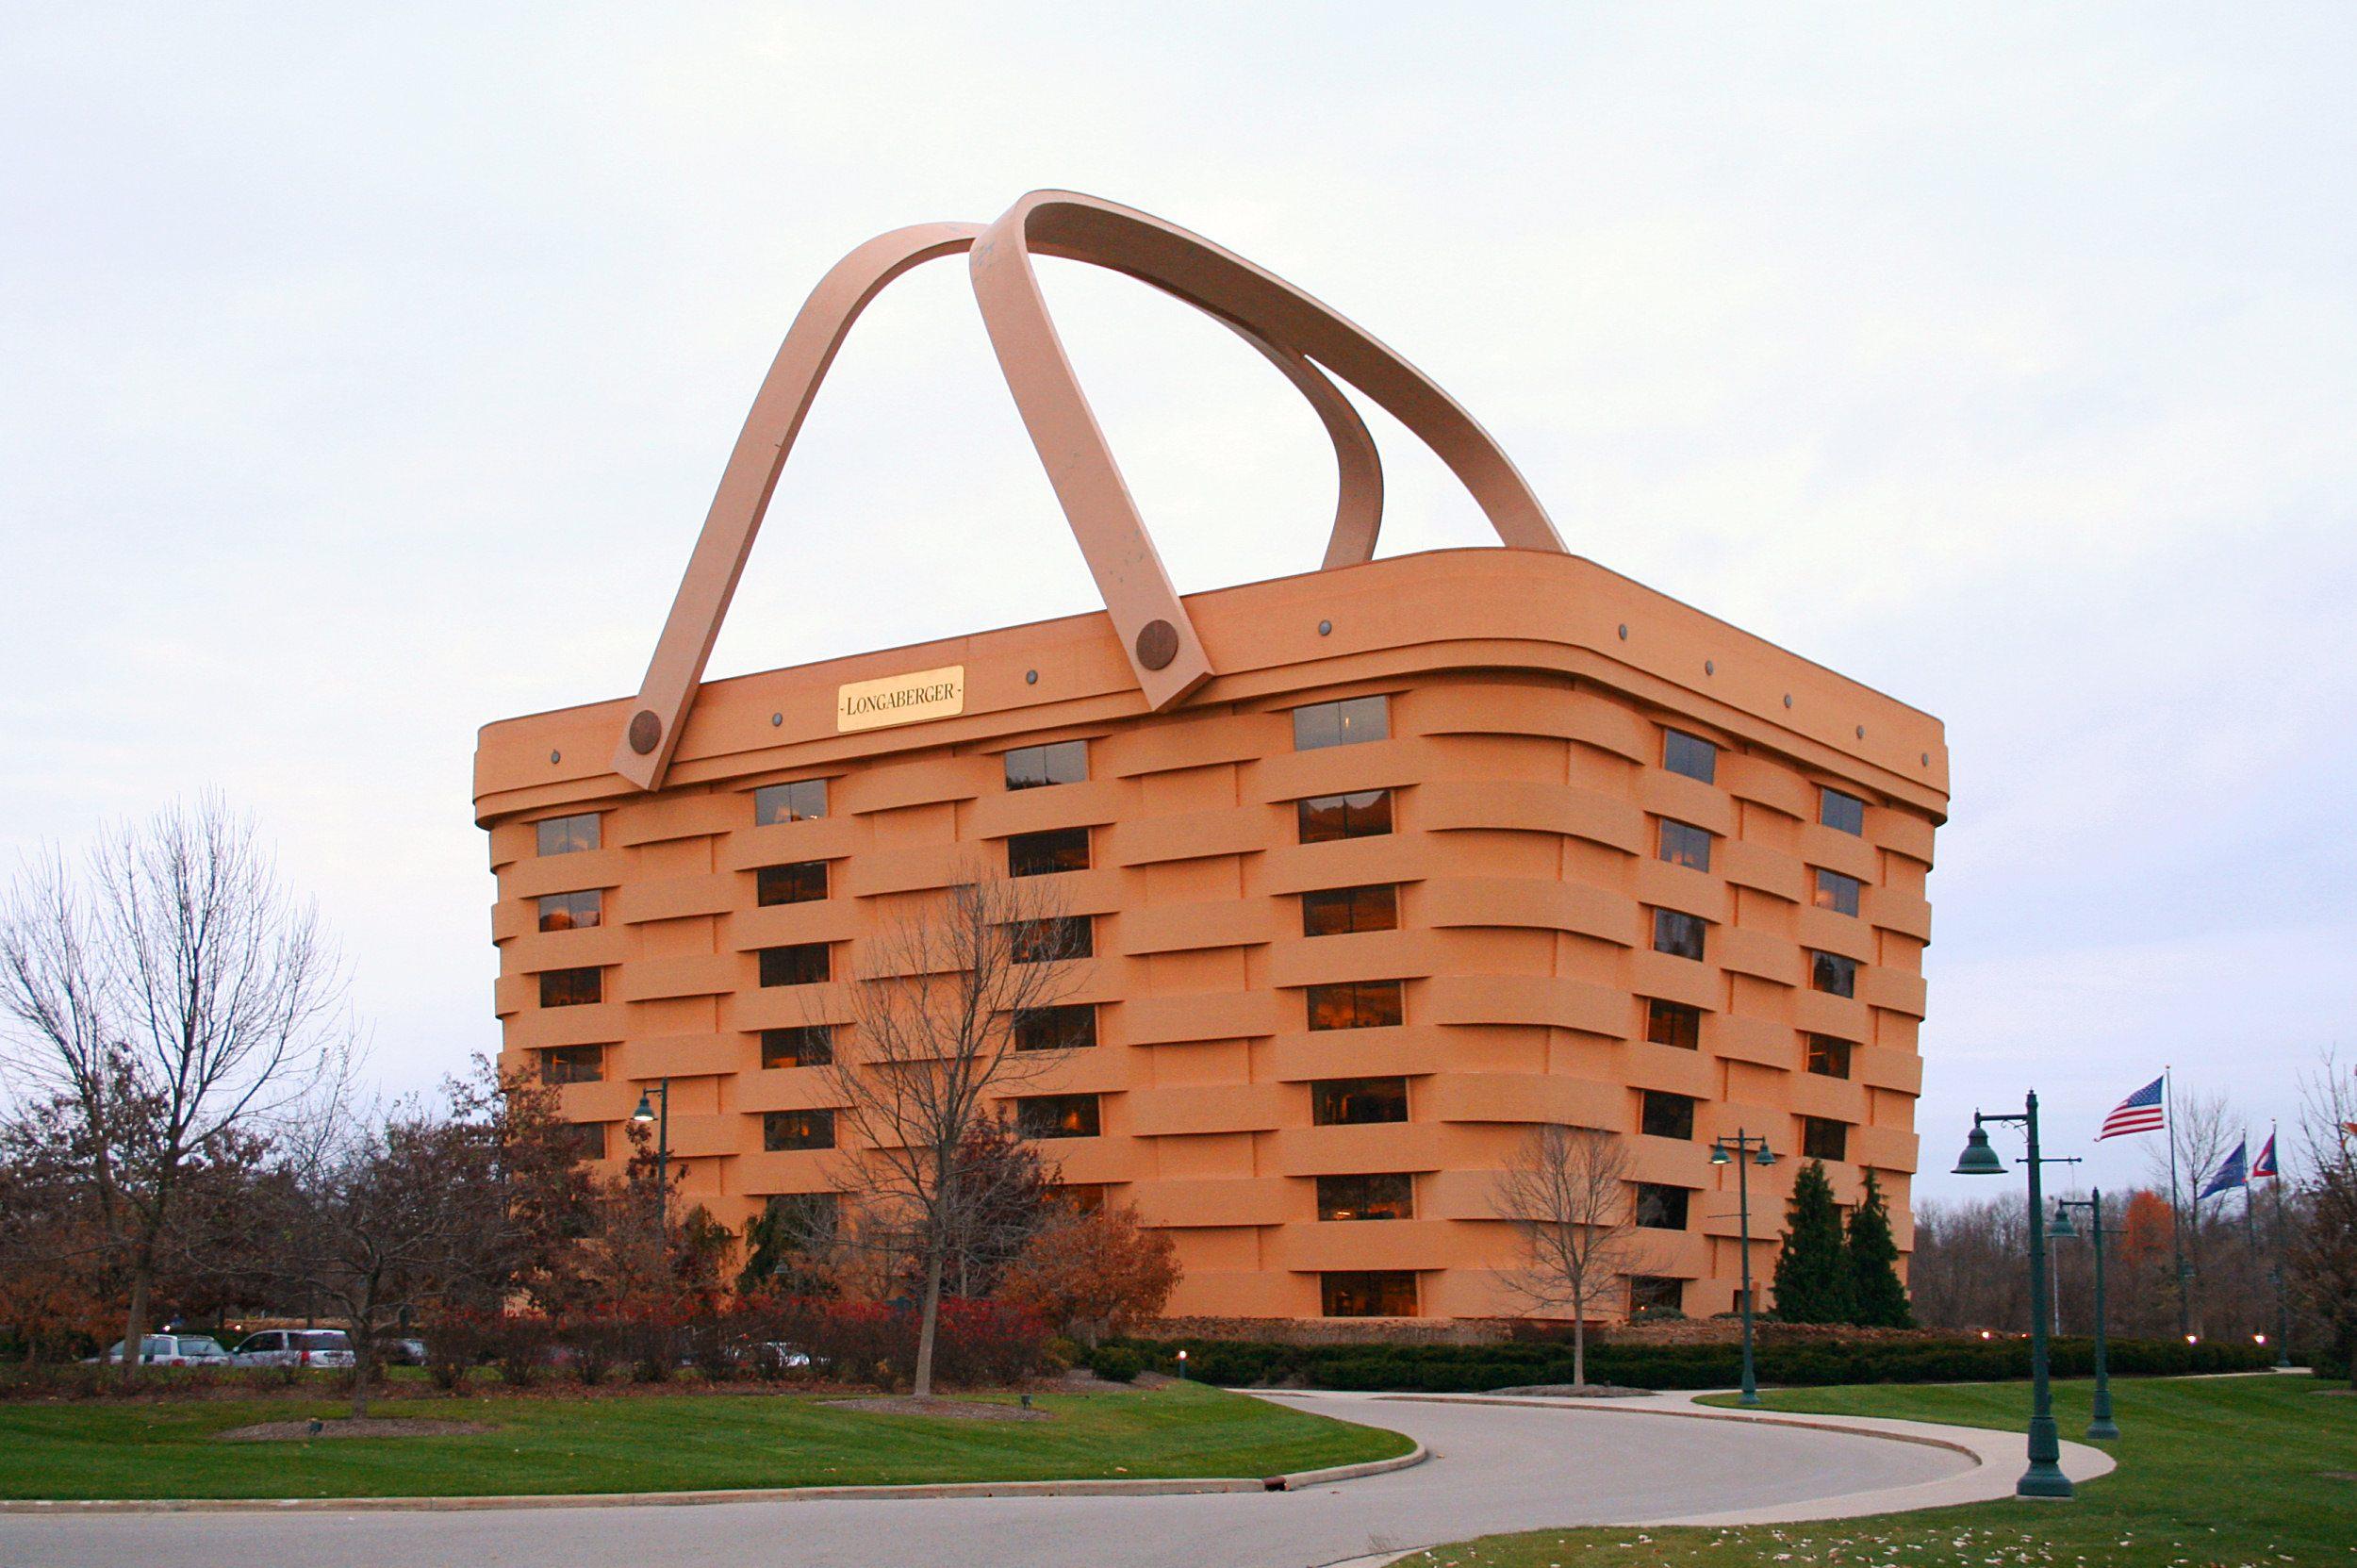 Longaberger headquarters